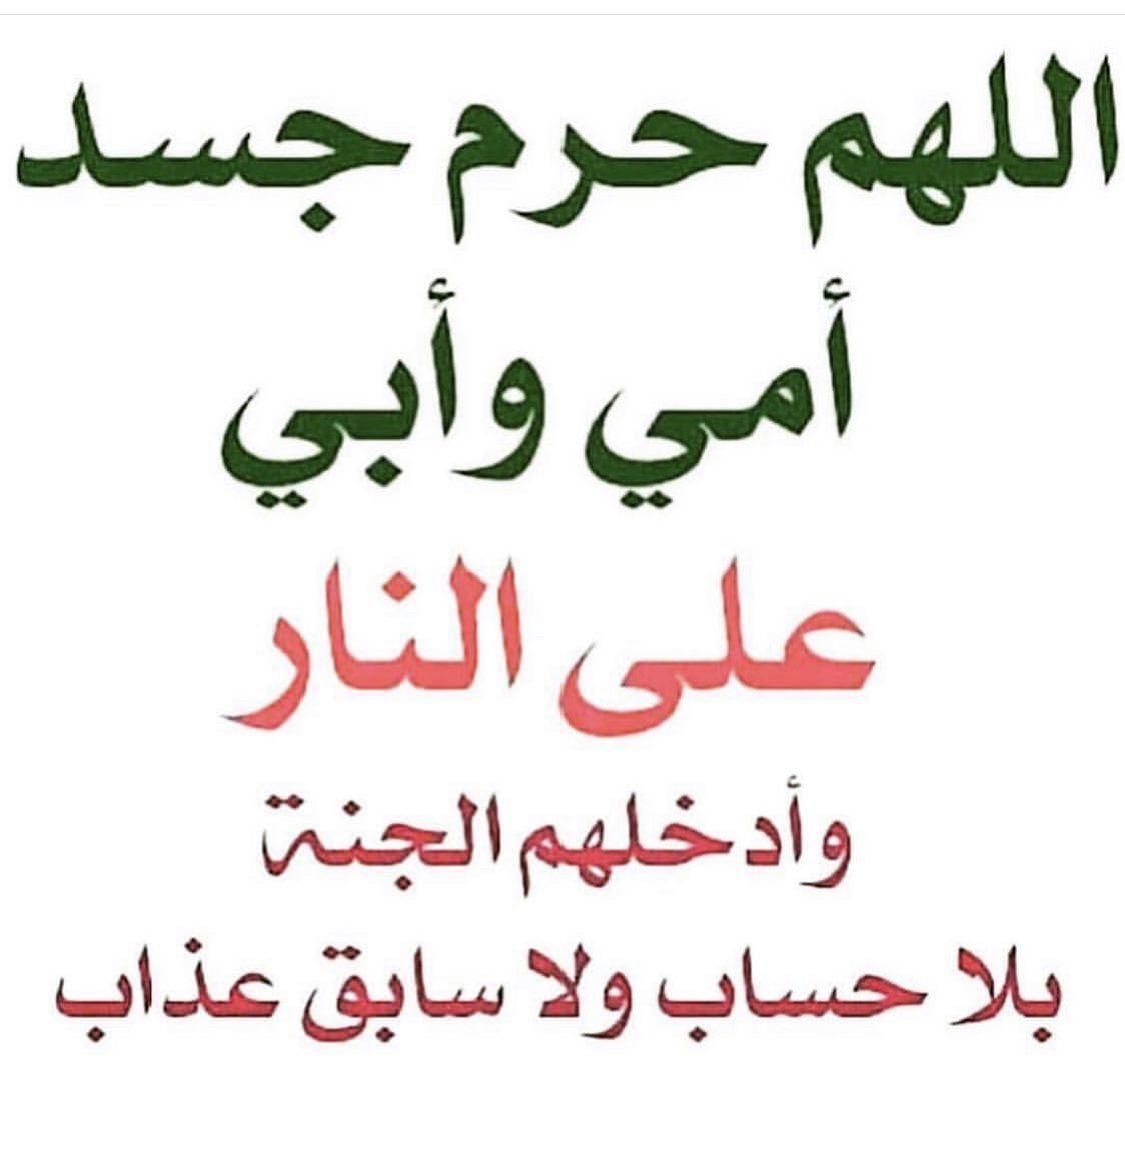 Pin By T Bird Q80 On طموحي وحلمي أمنيتي Islam Words Anime Muslim